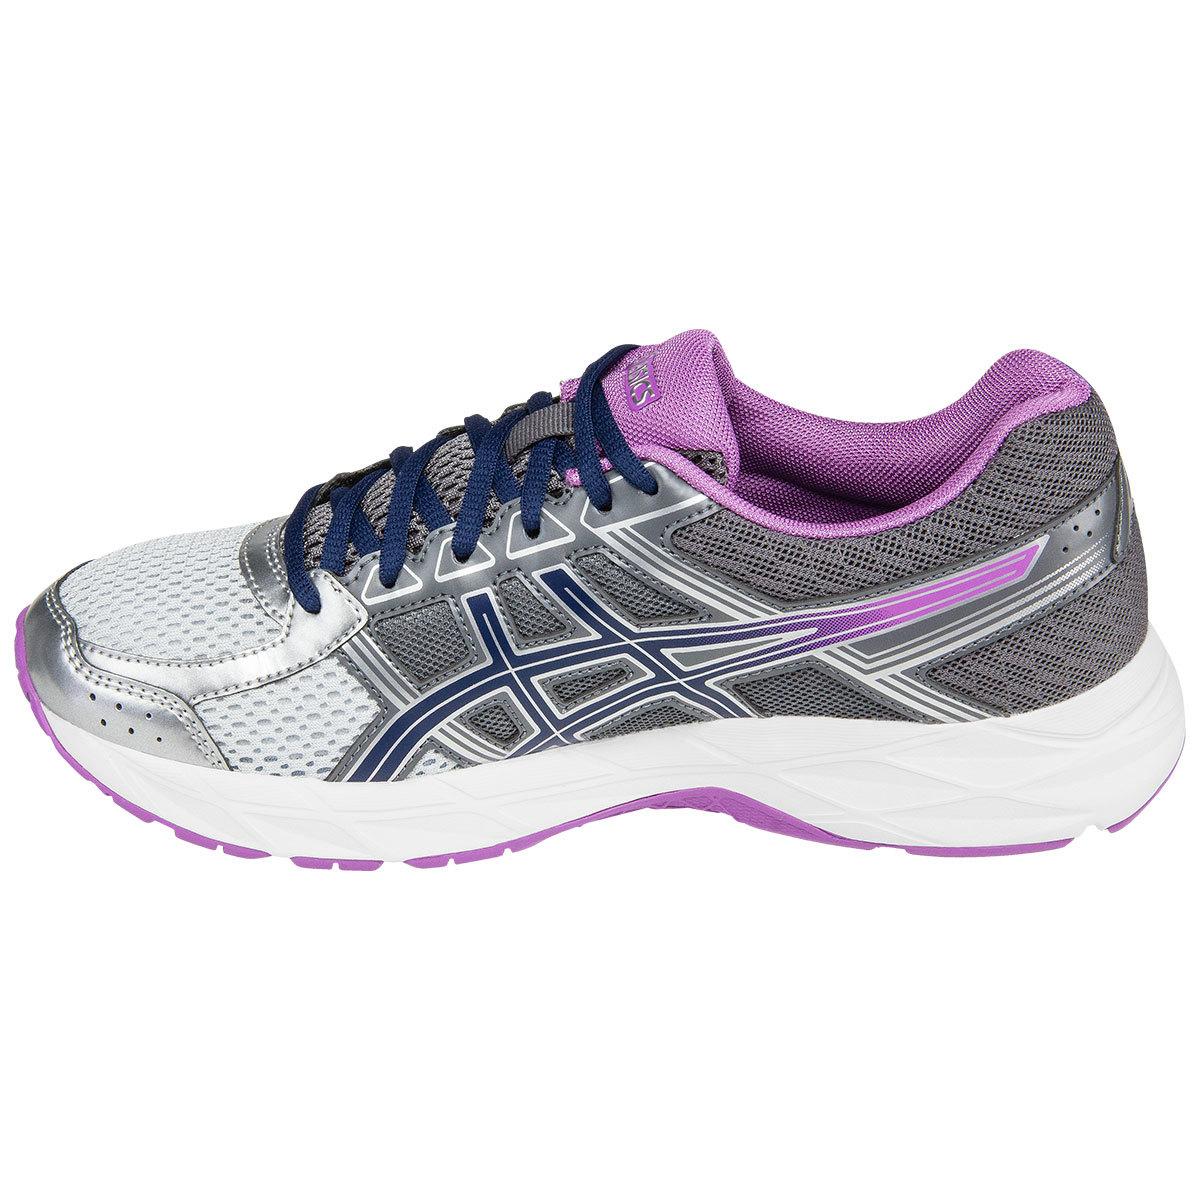 brand new c93f4 d2734 ASICS Women's GEL-Contend 4 Running Shoes, Carbon, Wide